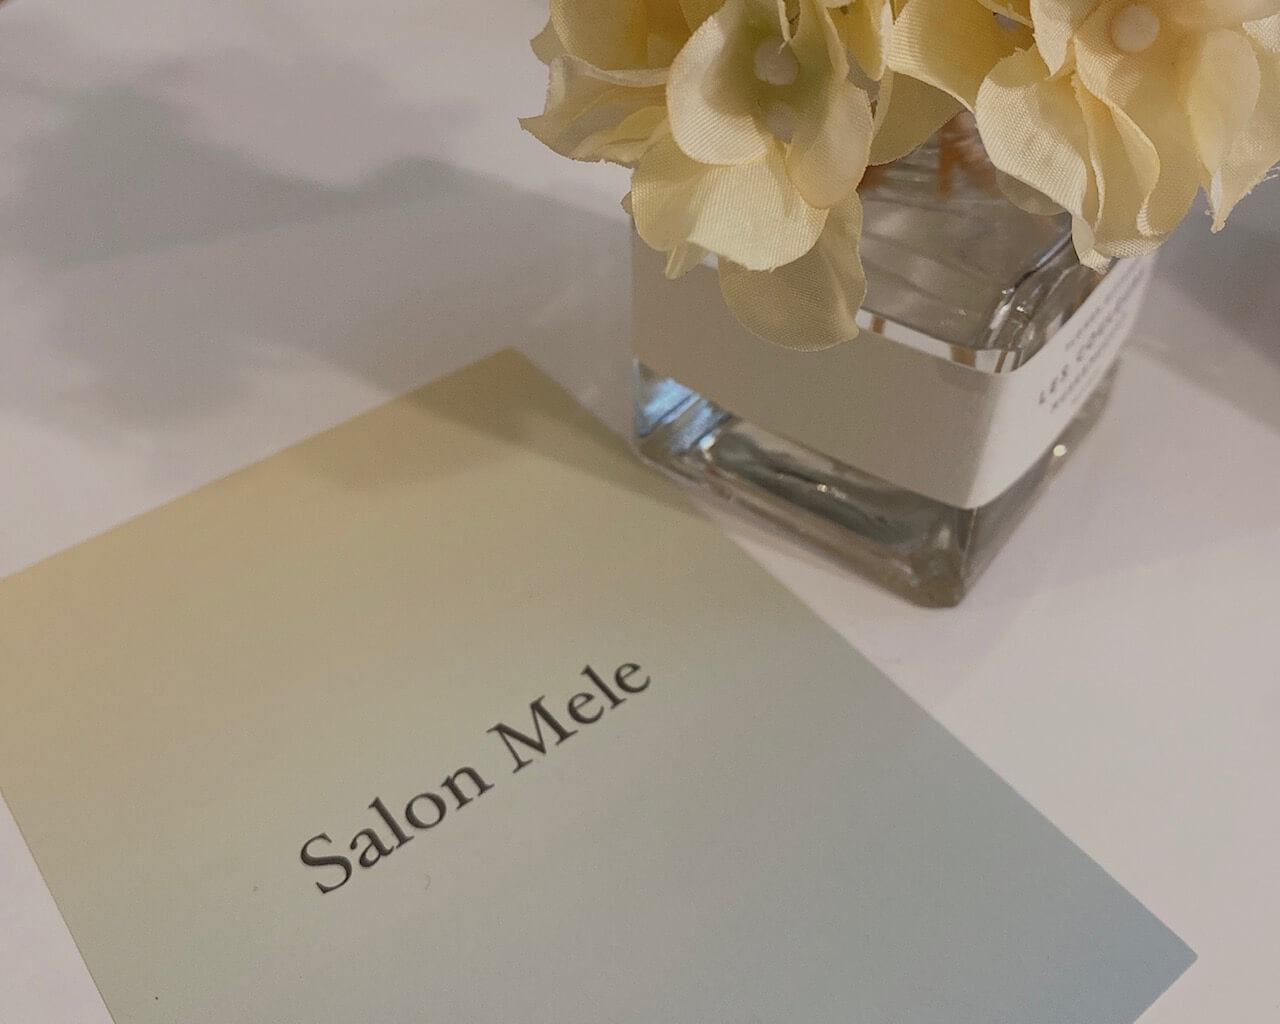 Salon Mele(サロン メレ)img3